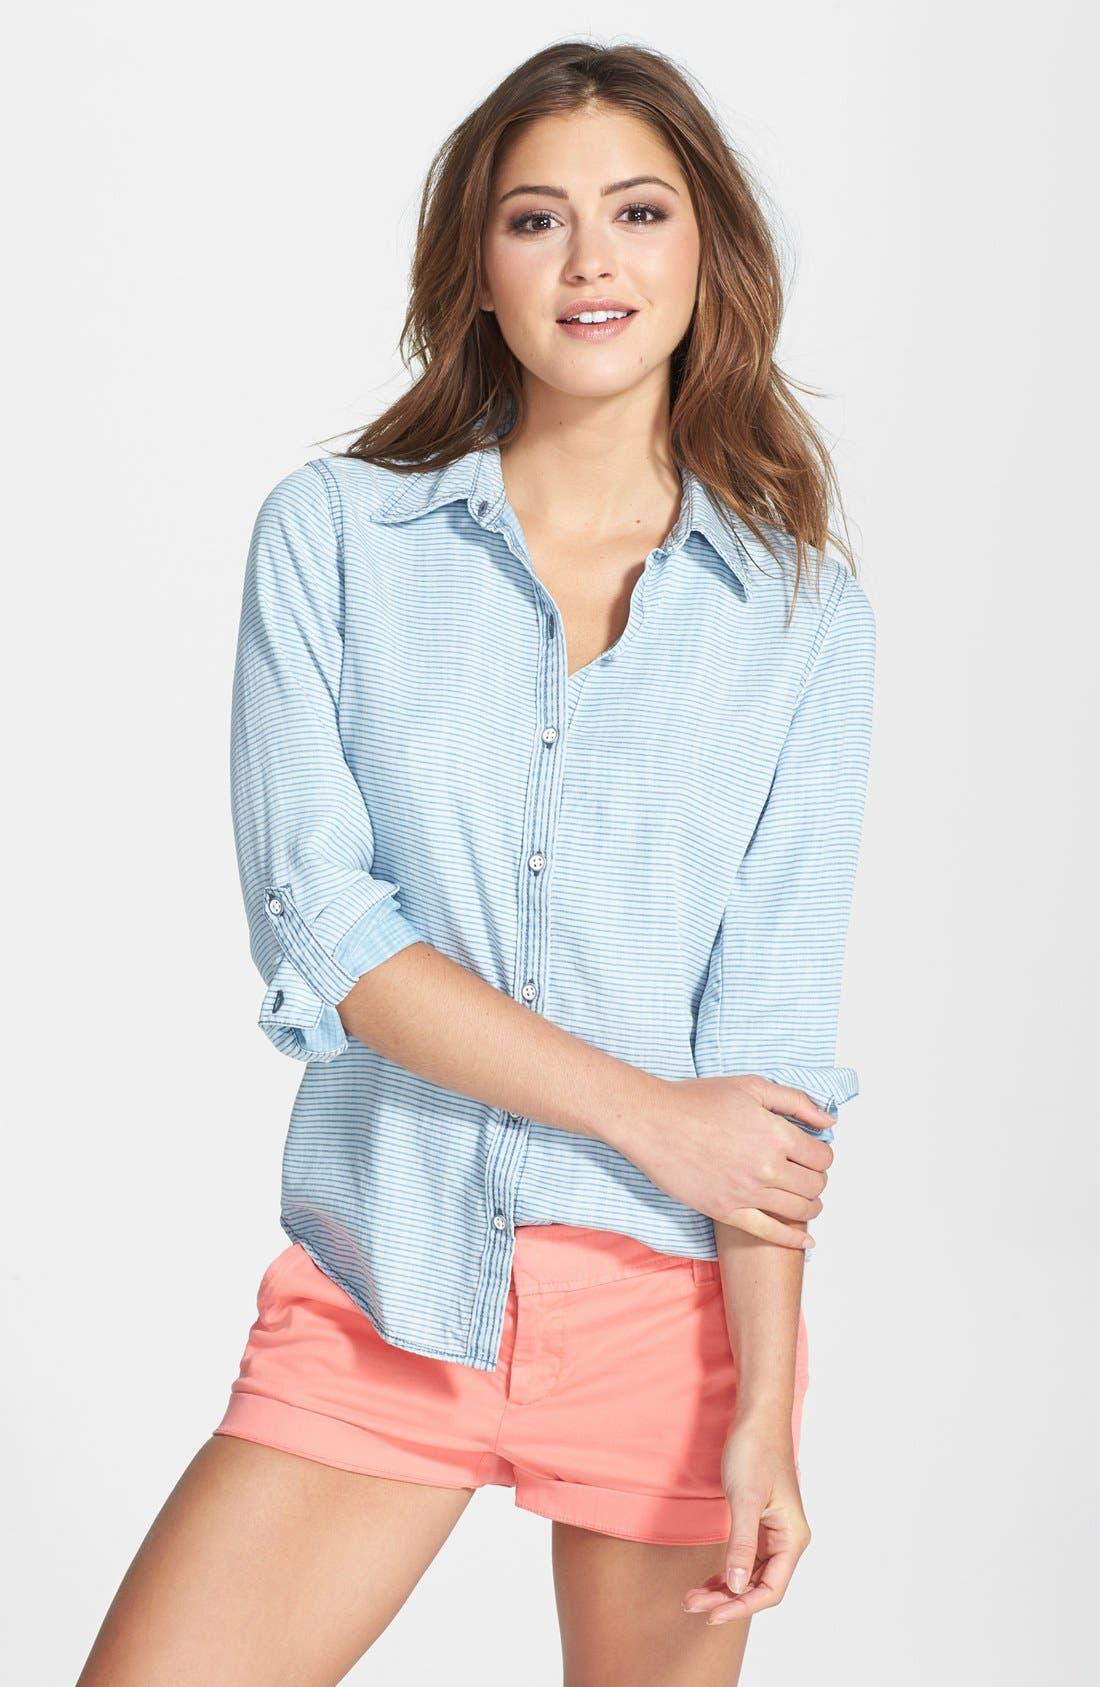 Alternate Image 1 Selected - Foxcroft Modern Fit Stripe Chambray Shirt (Regular & Petite)